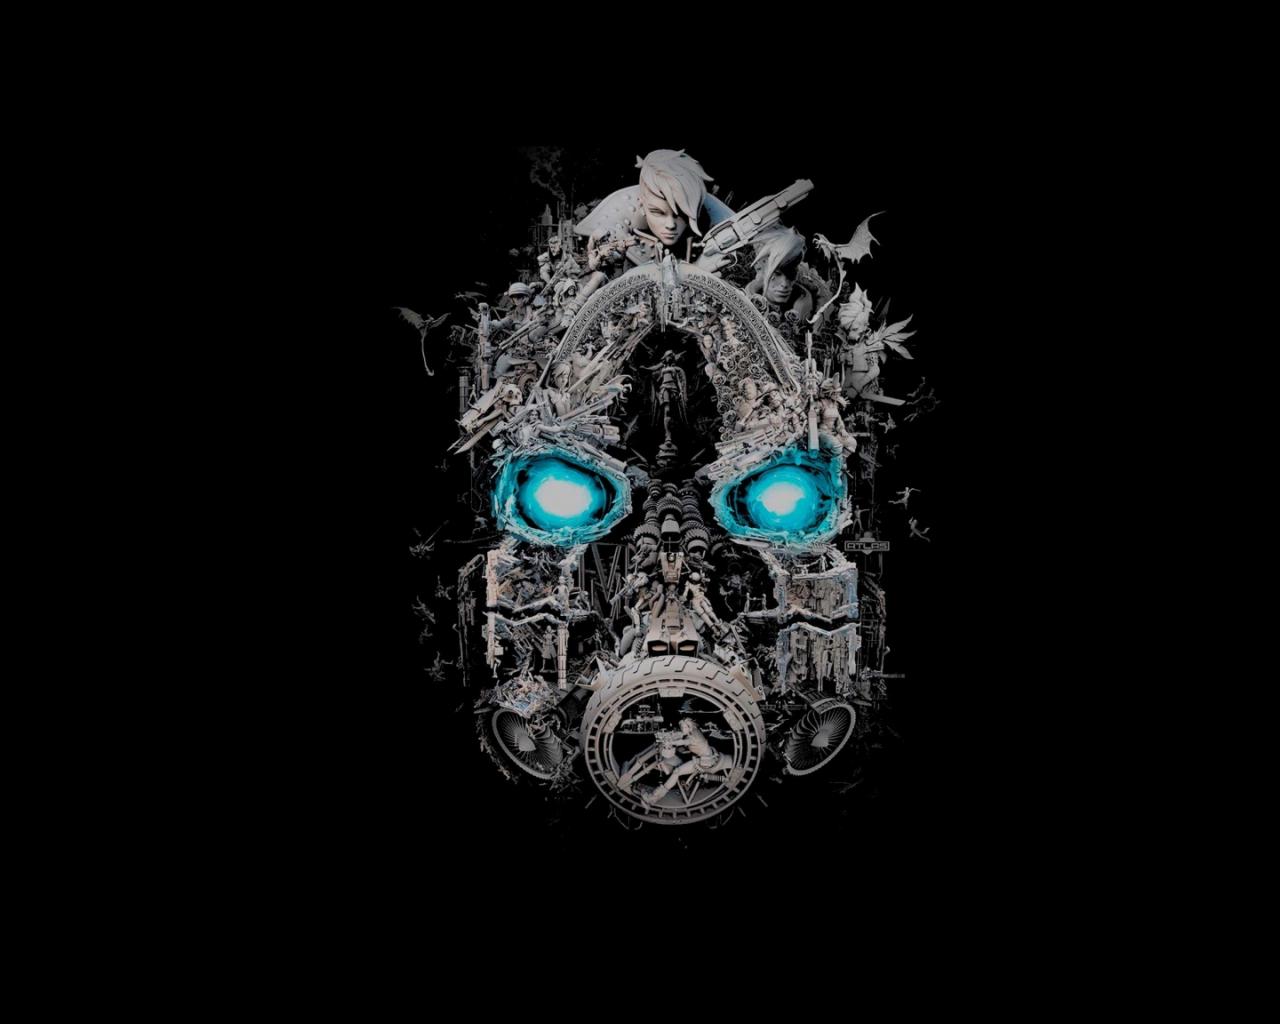 Free download 20x20 Borderlands 20 Mask of Mayhem 20x20 ...